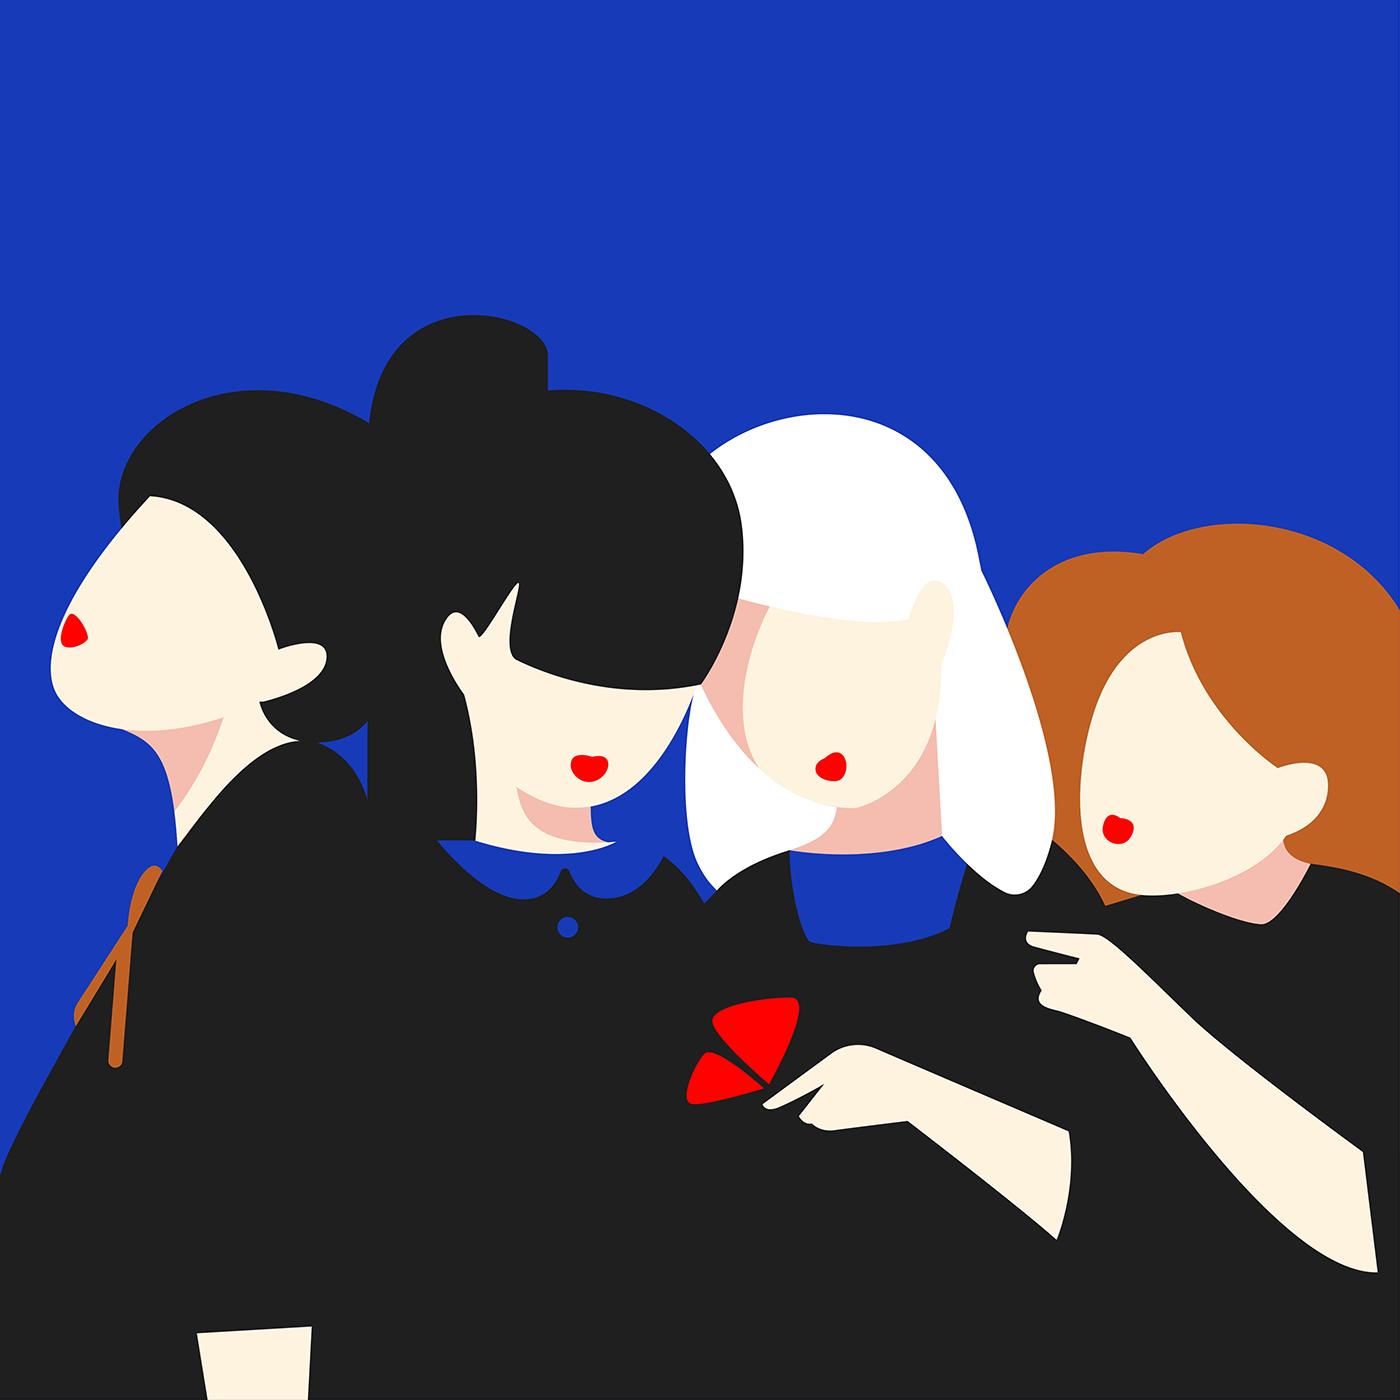 blue chicki girls ILLUSTRATION  Russia vector women conceptual idea MARIA FEDOSEEVA